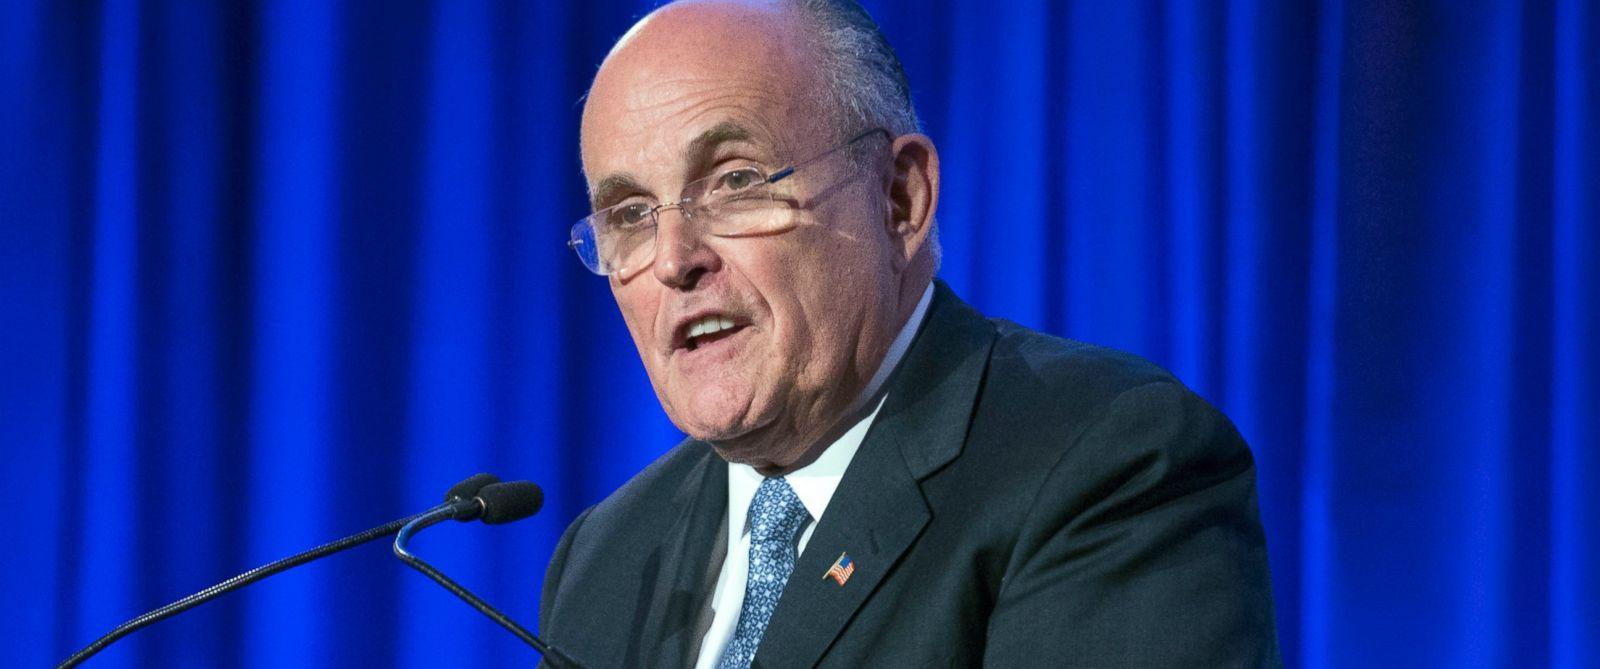 PHOTO: Former New York City Mayor Rudy Giuliani speaks in New York, May 12, 2014.